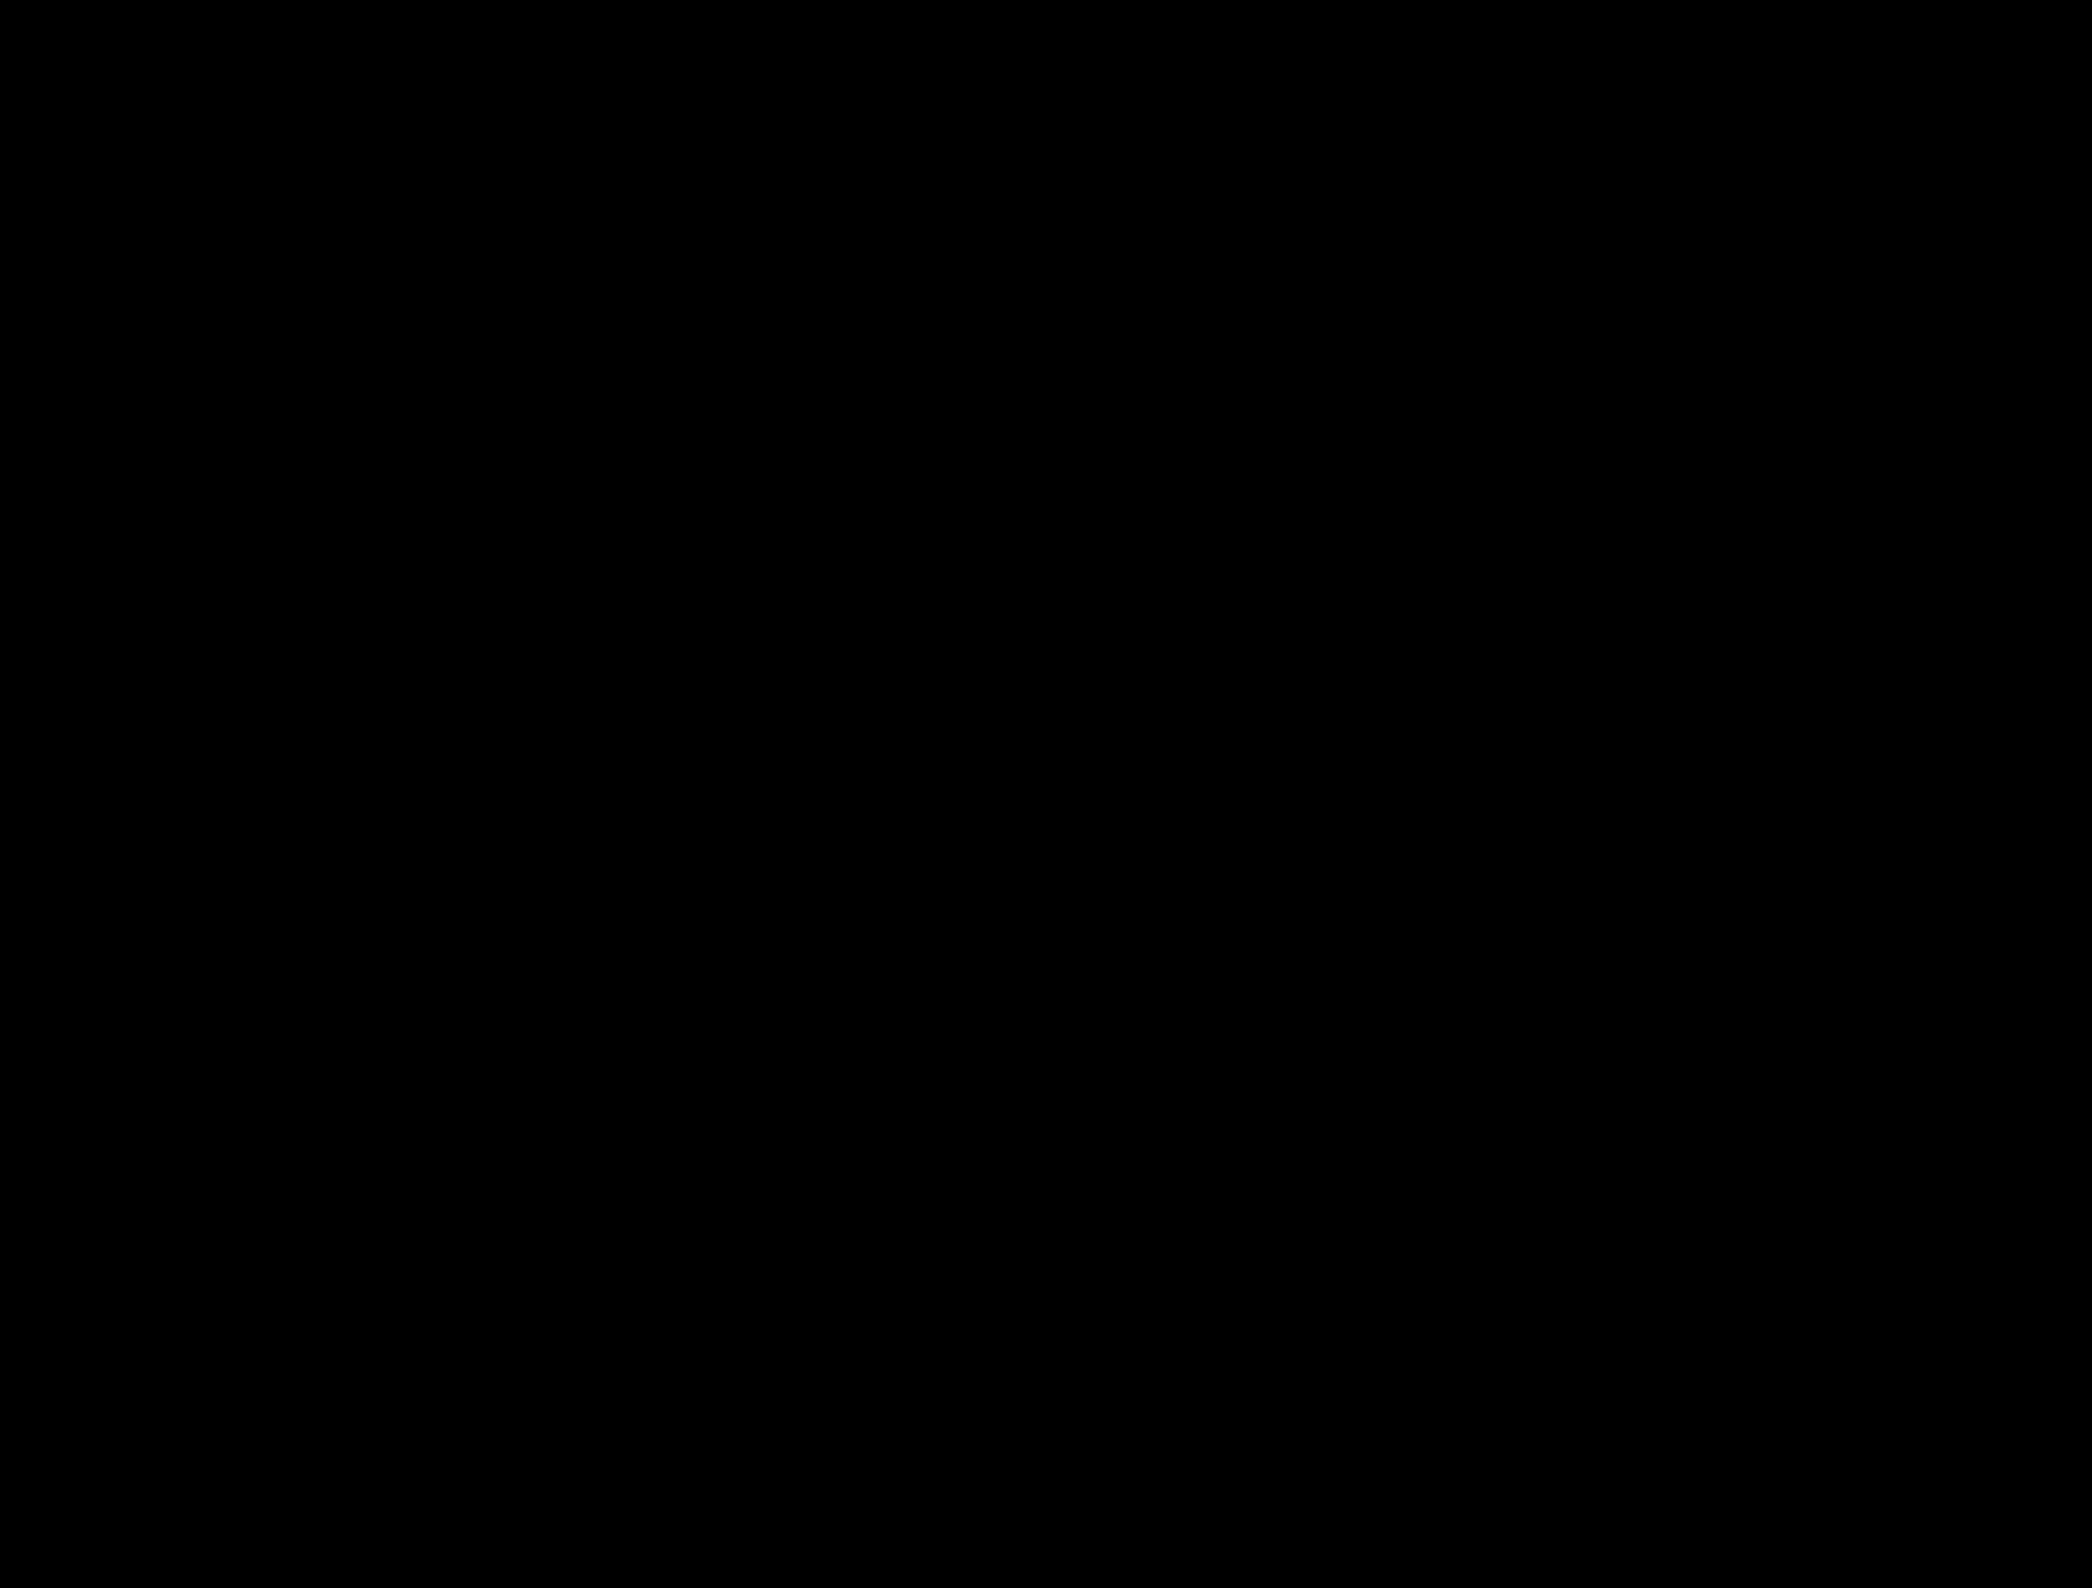 2092x1588 Clipart